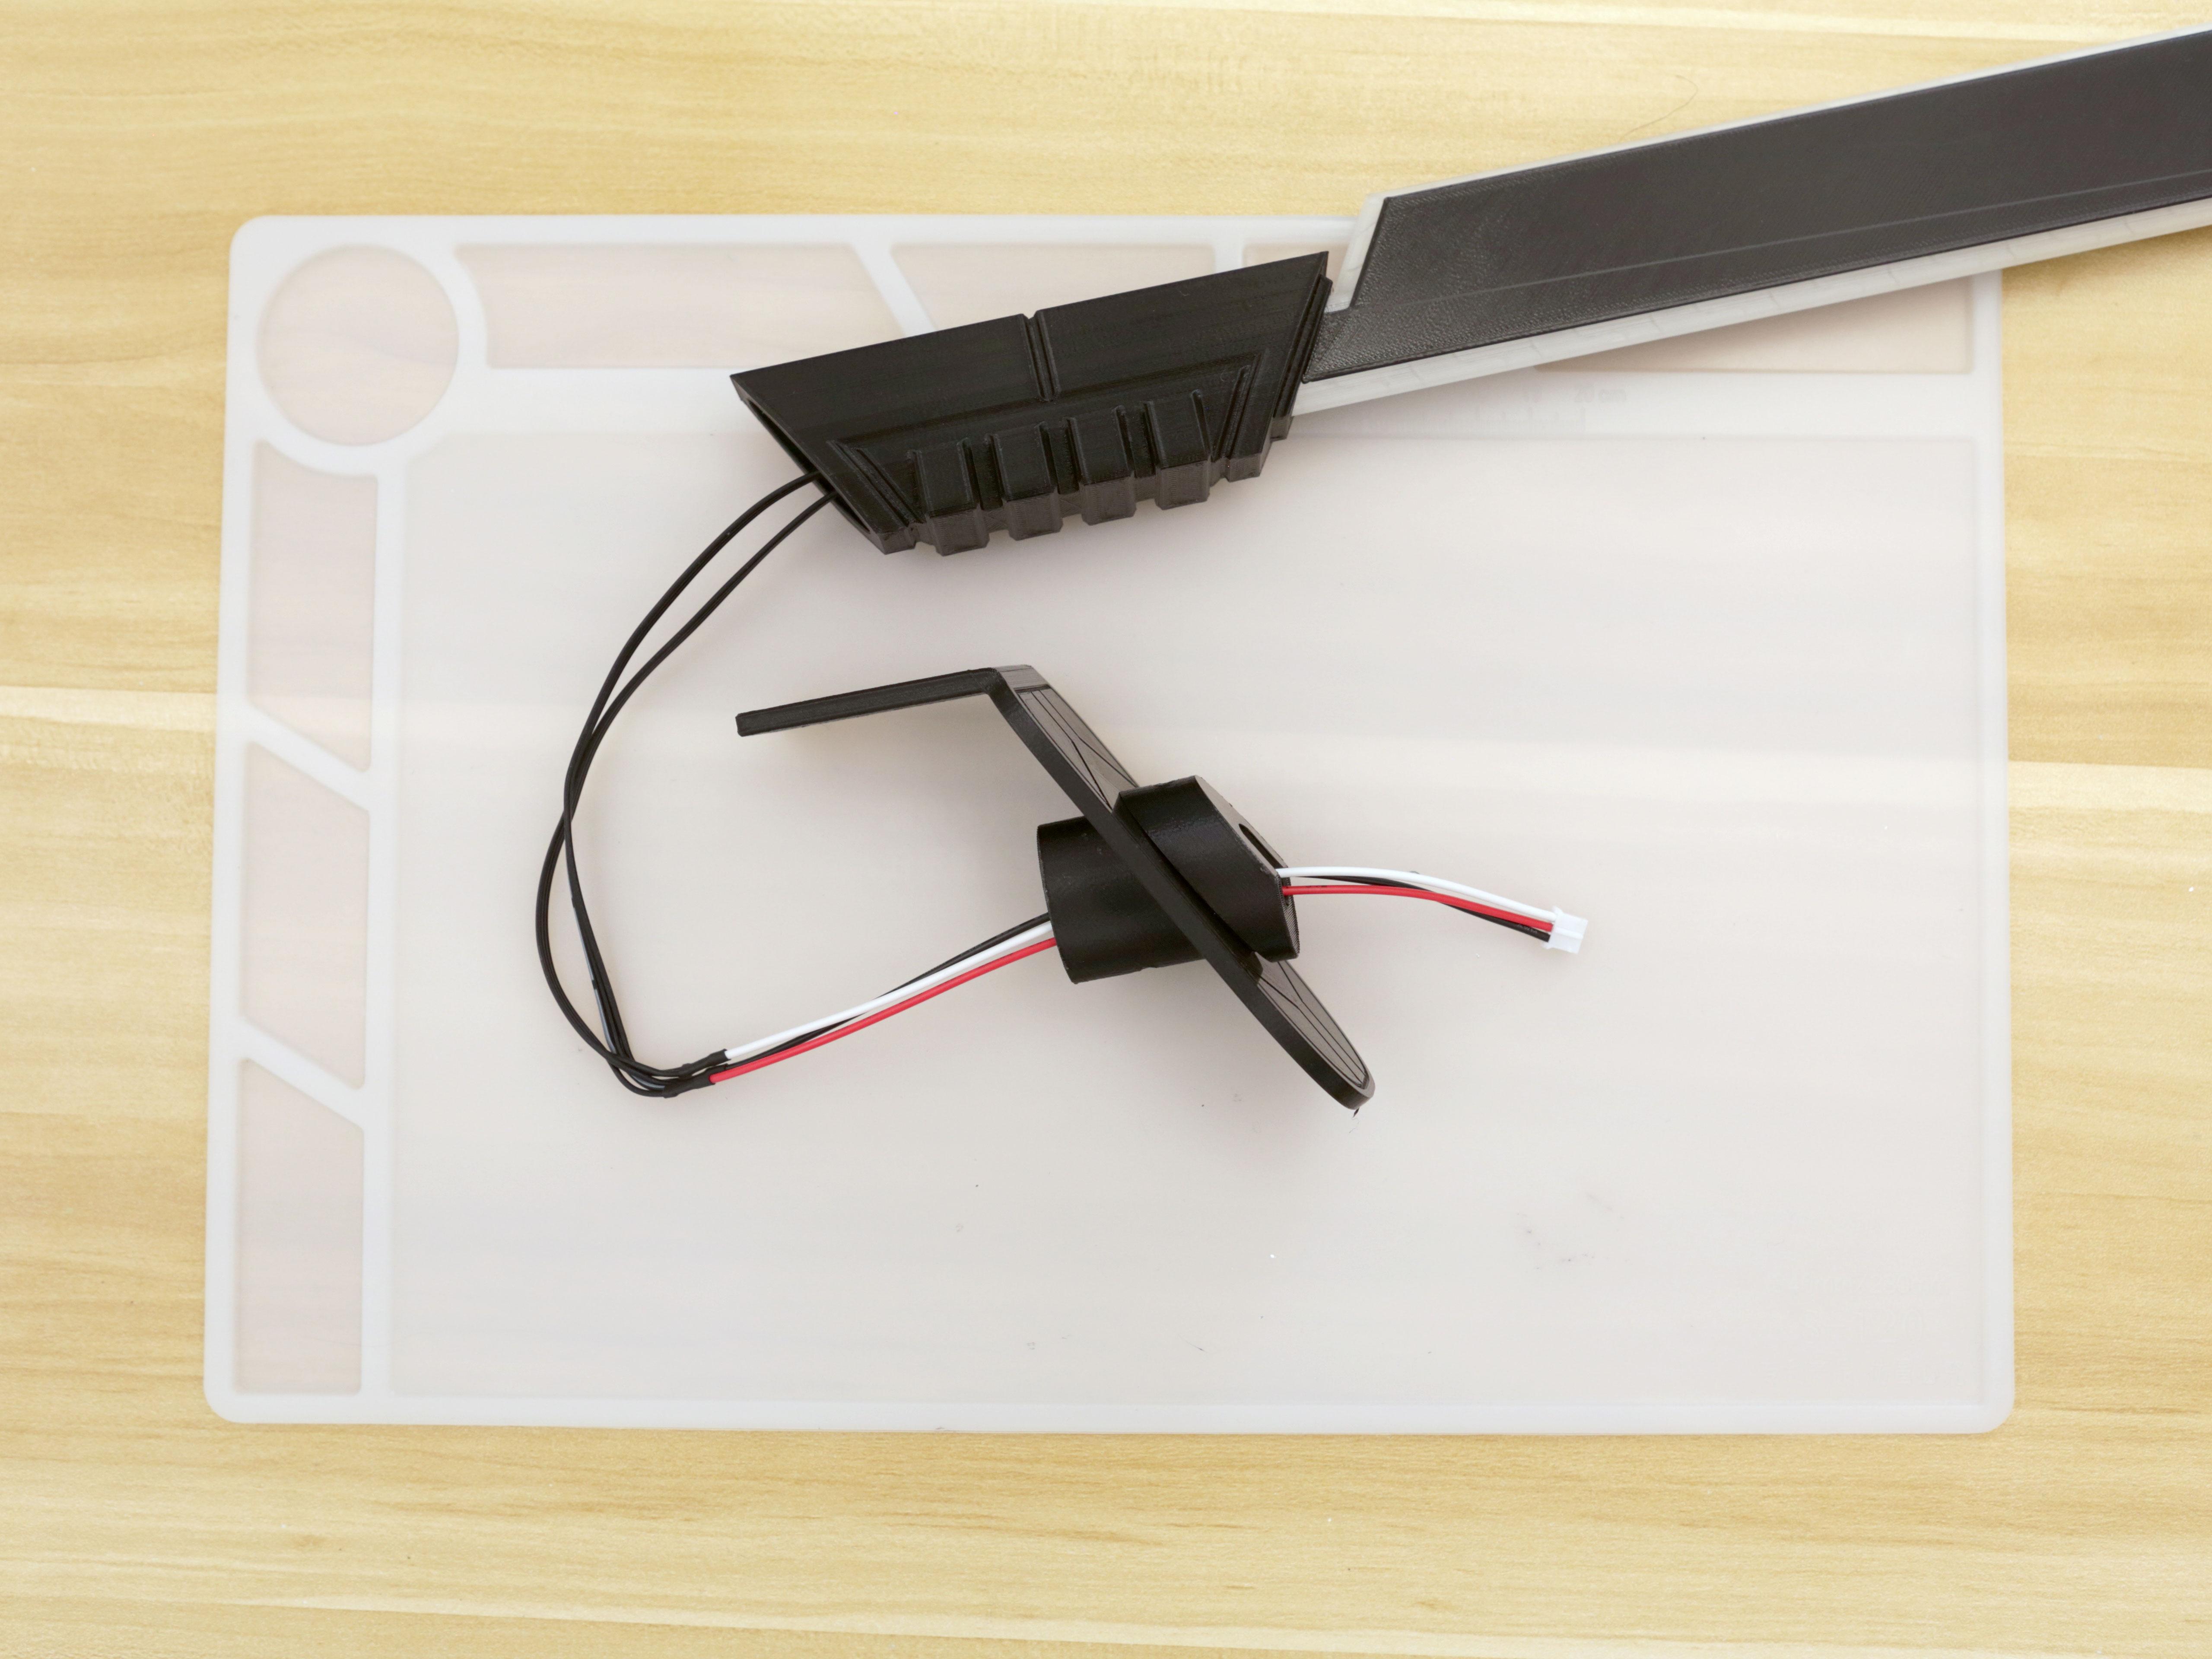 3d_printing_coupler-strip-cable-thru.jpg